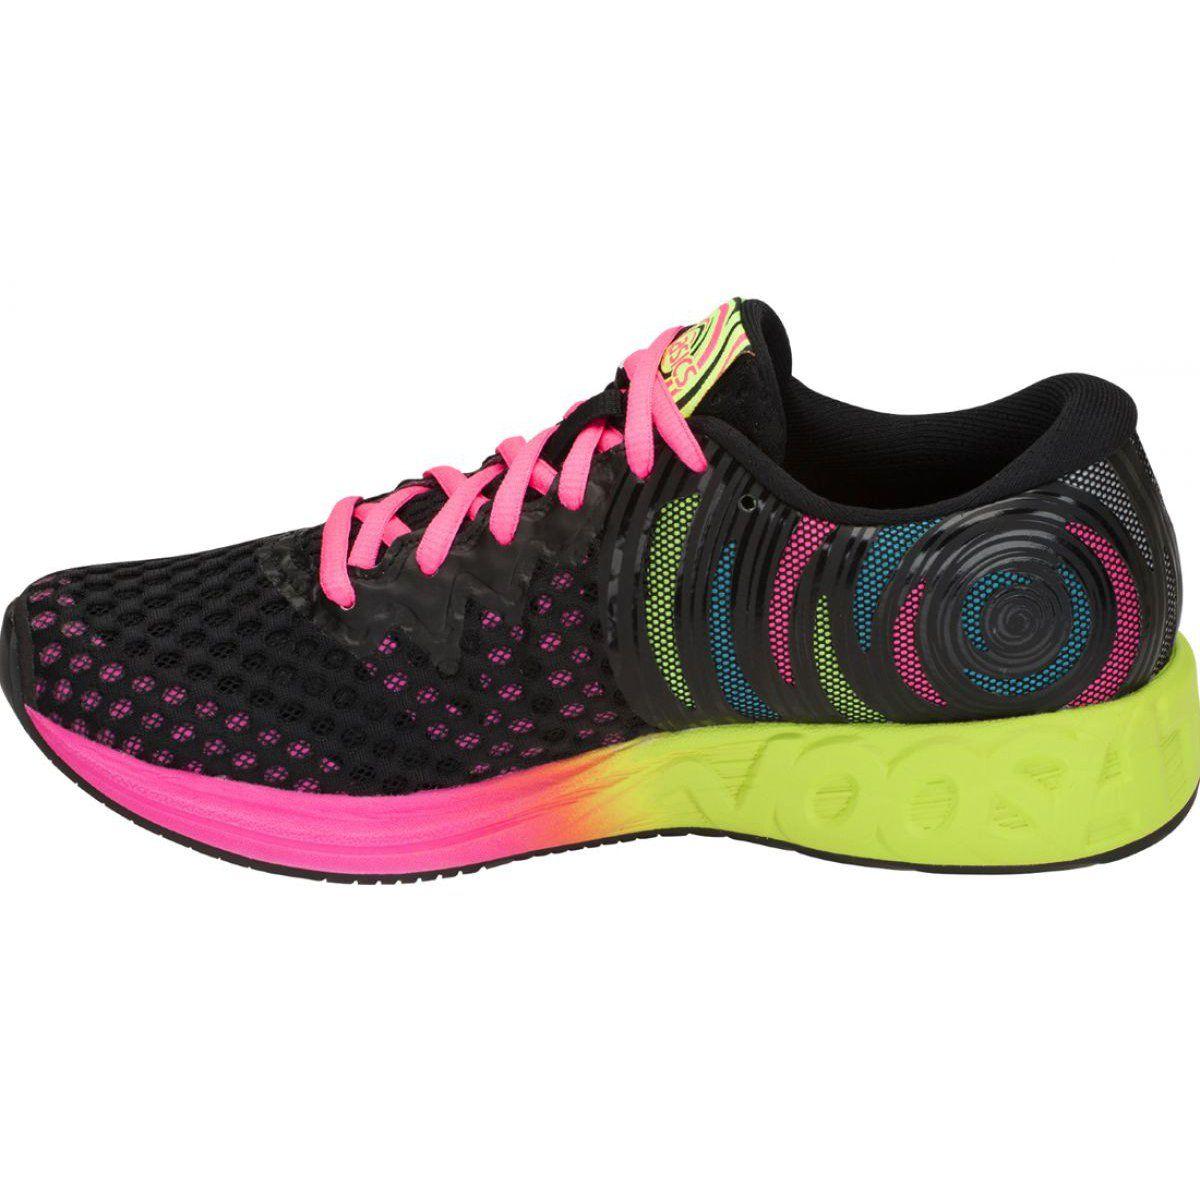 Buty Do Biegania Asics Gel Noosa Ff 2 W T869n 001 Czarne Wielokolorowe Asics Gel Noosa Black Running Shoes Running Shoes